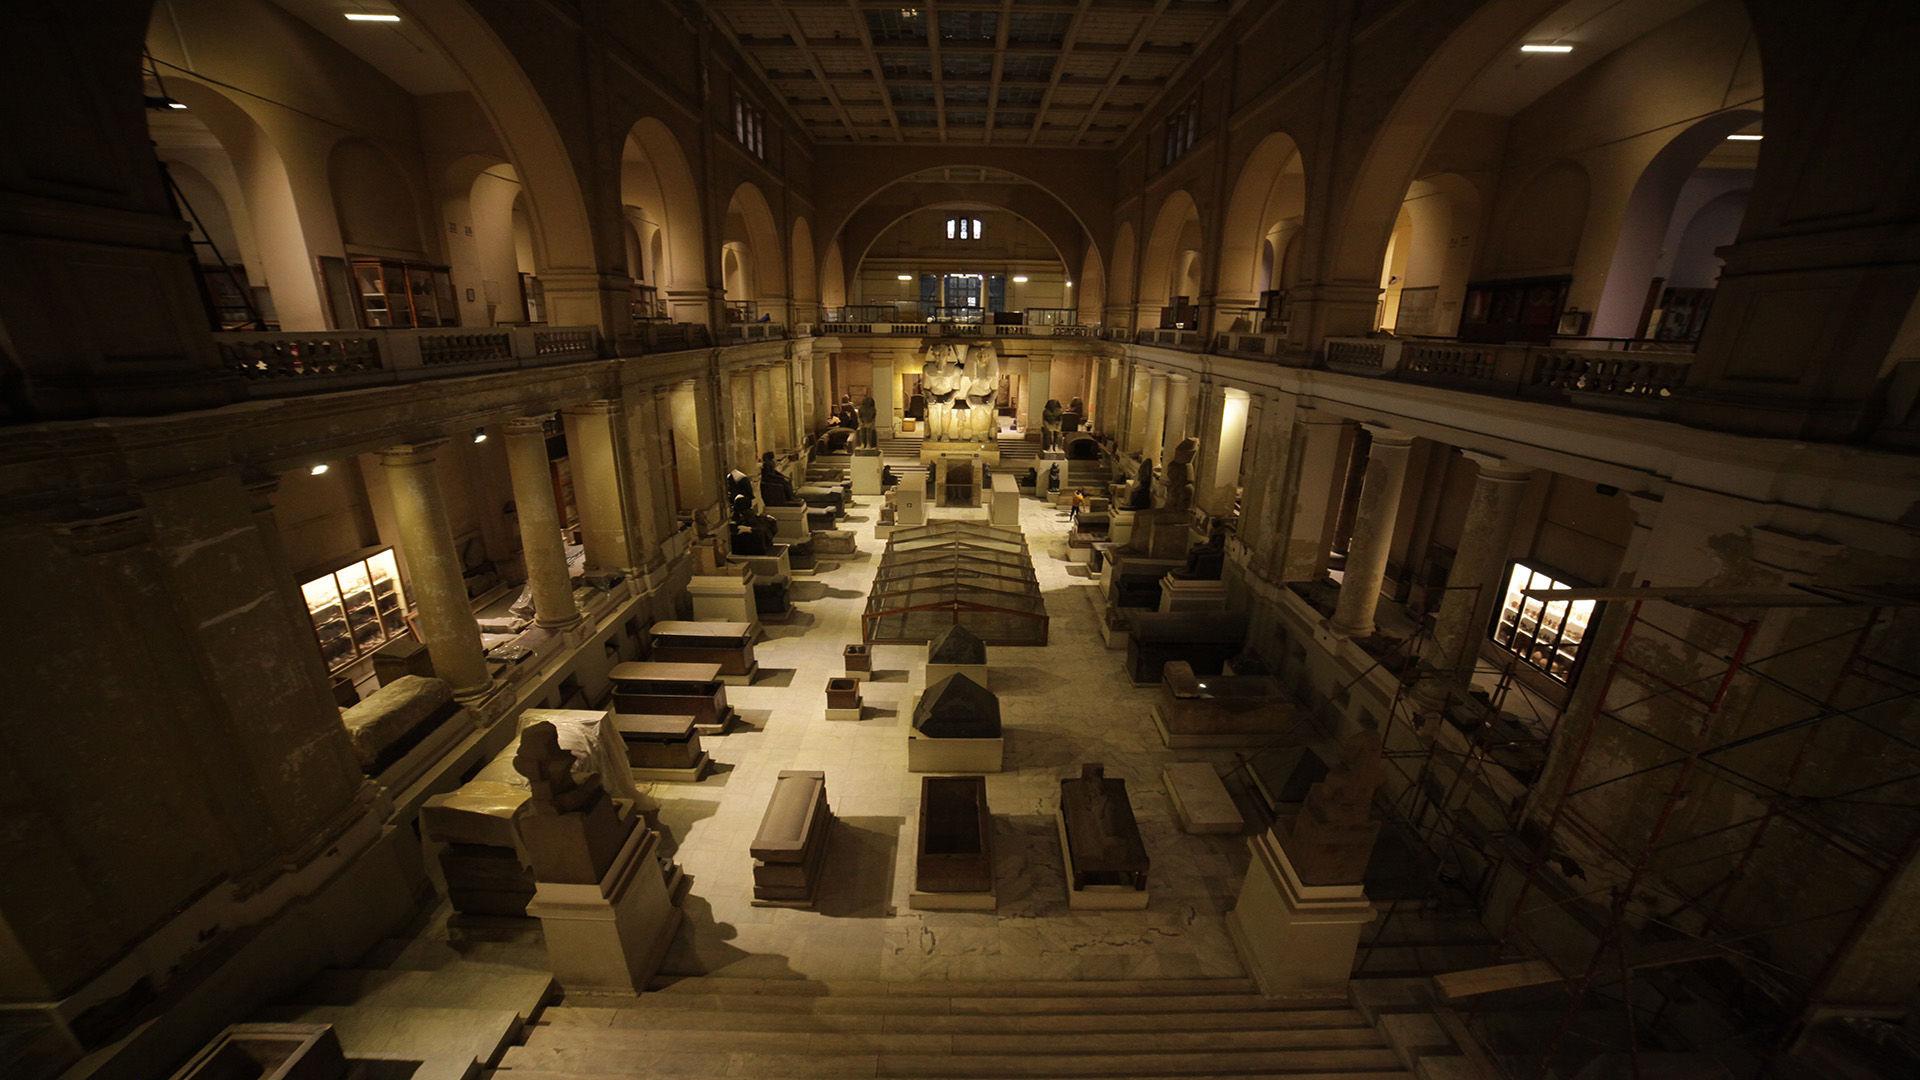 Tut's Treasures: Hidden Secrets — s01e01 — Treasures Rediscovered